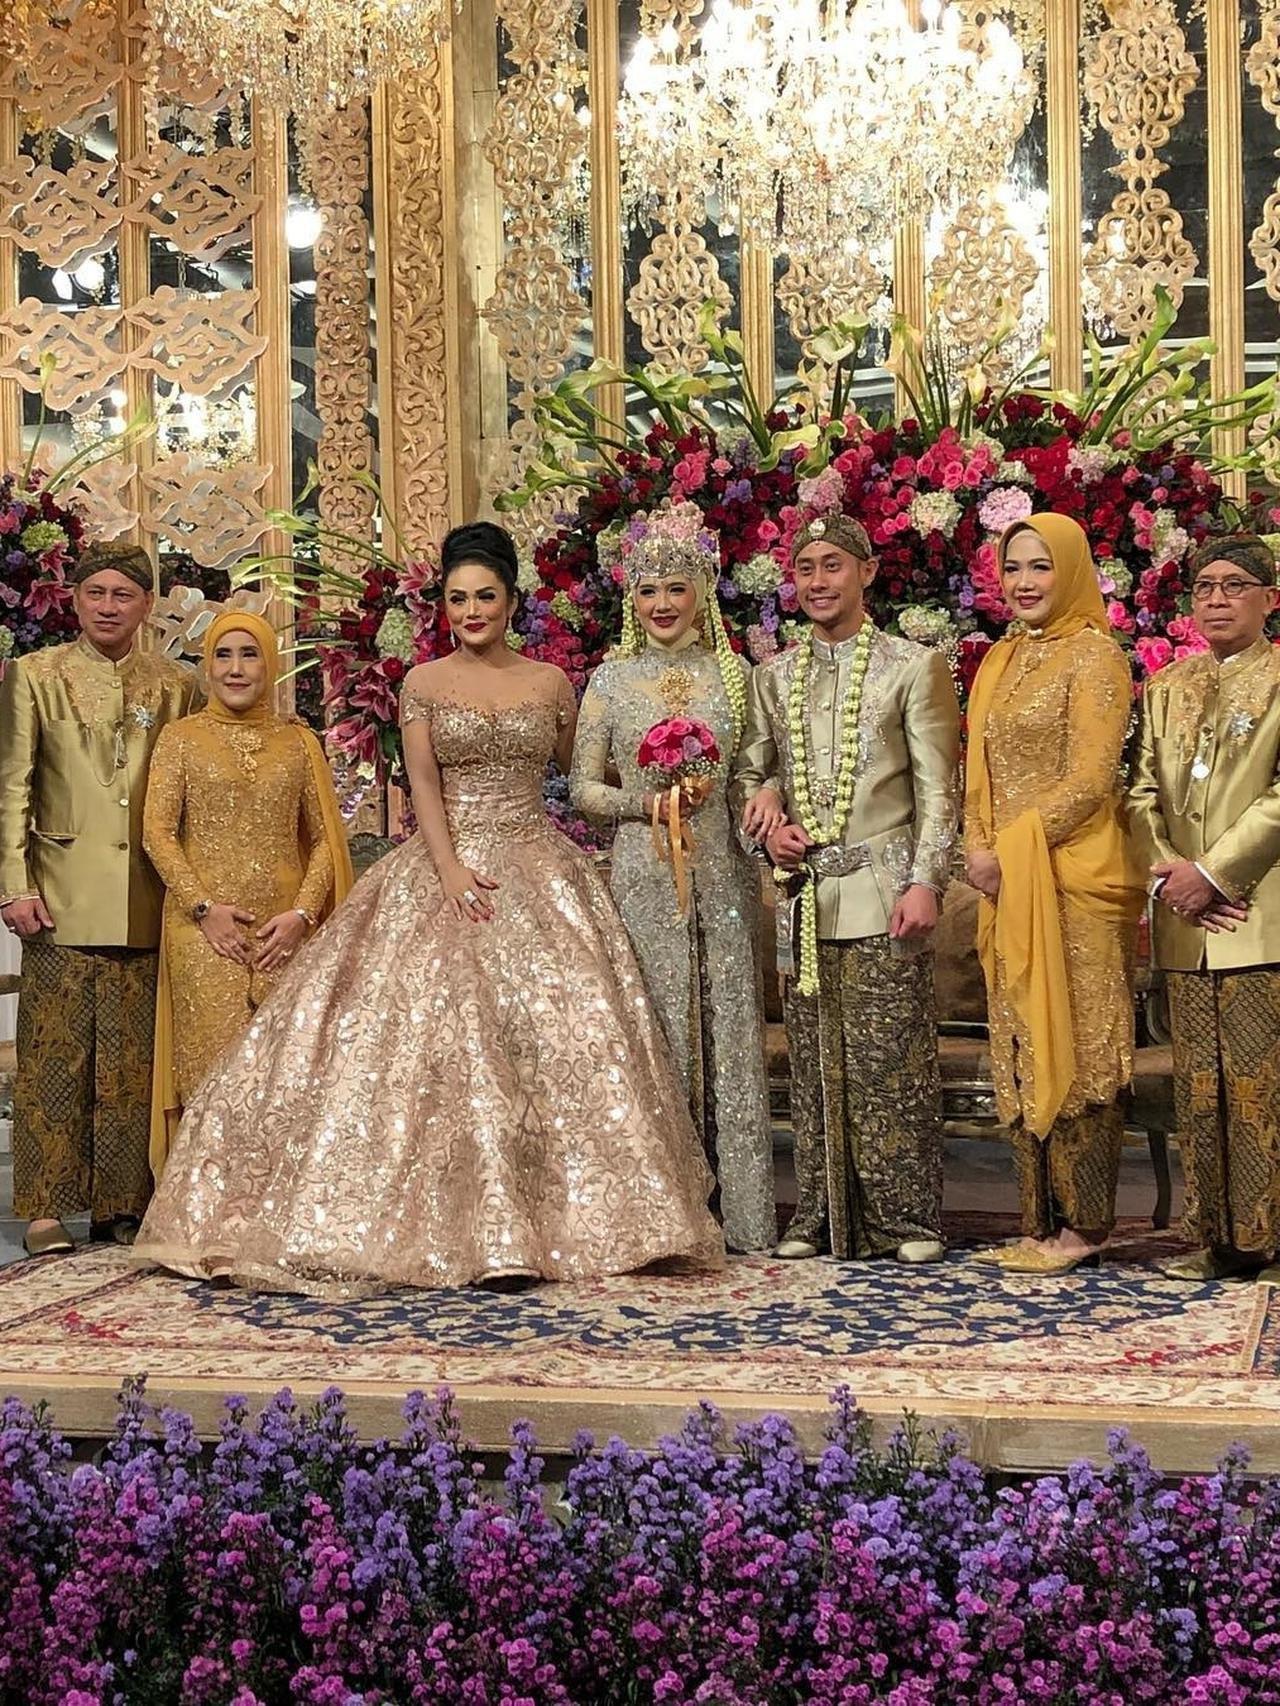 Design Foto Gaun Pengantin Muslimah Etdg Hijab Wedding Kekinian Bagus Gaun Pengantin Sunda Siger